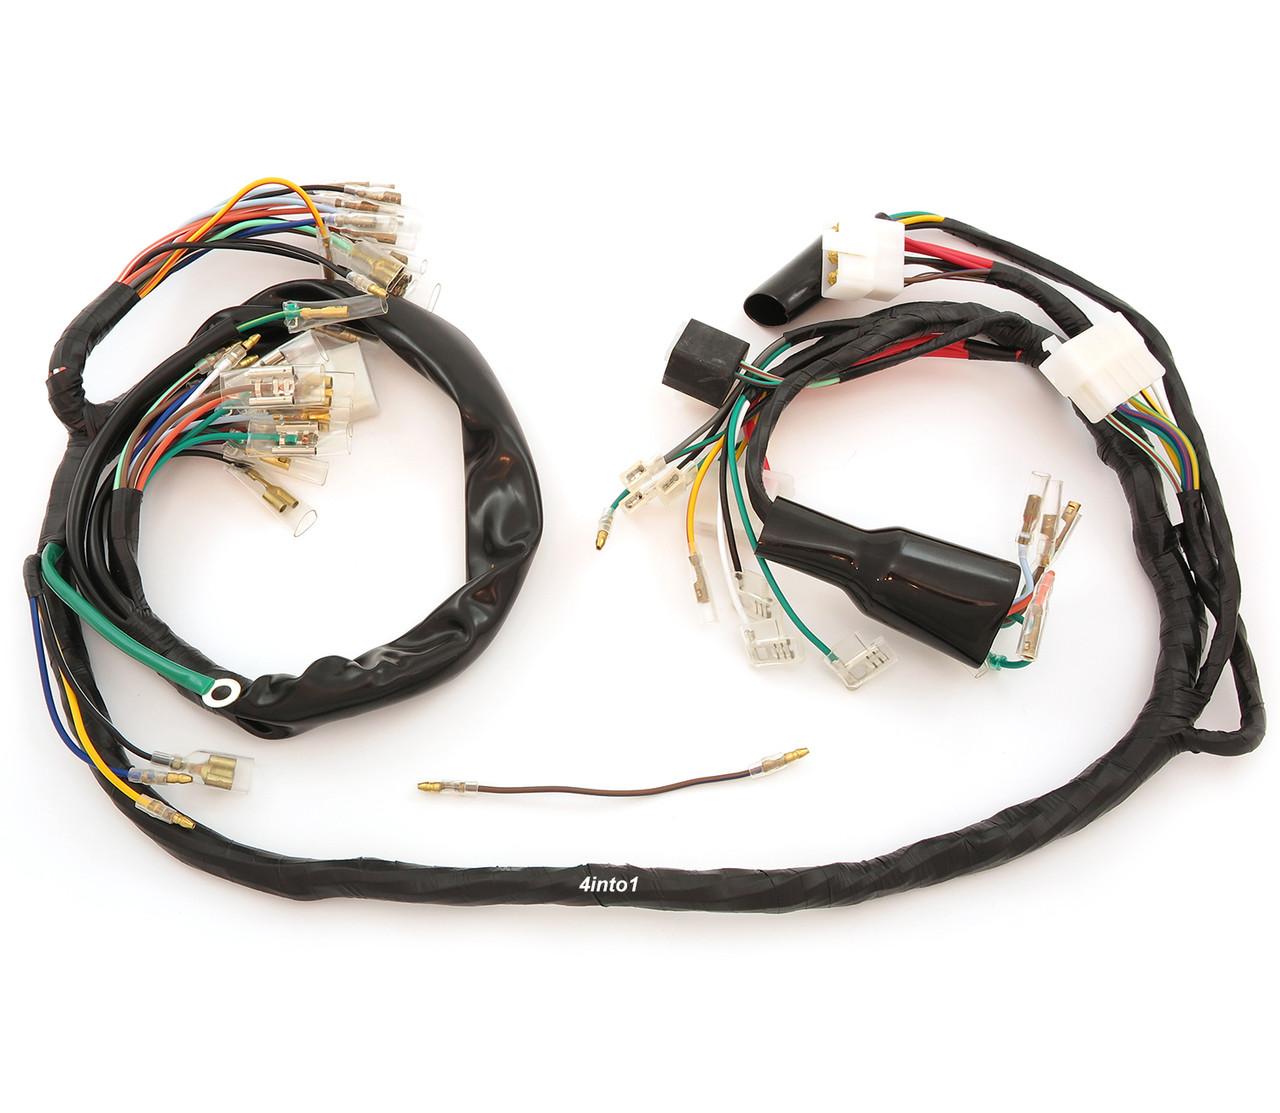 Cb750 Wiring Harness Library Main 32100 392 000 Honda Cb750f 1975 1976 Image 1